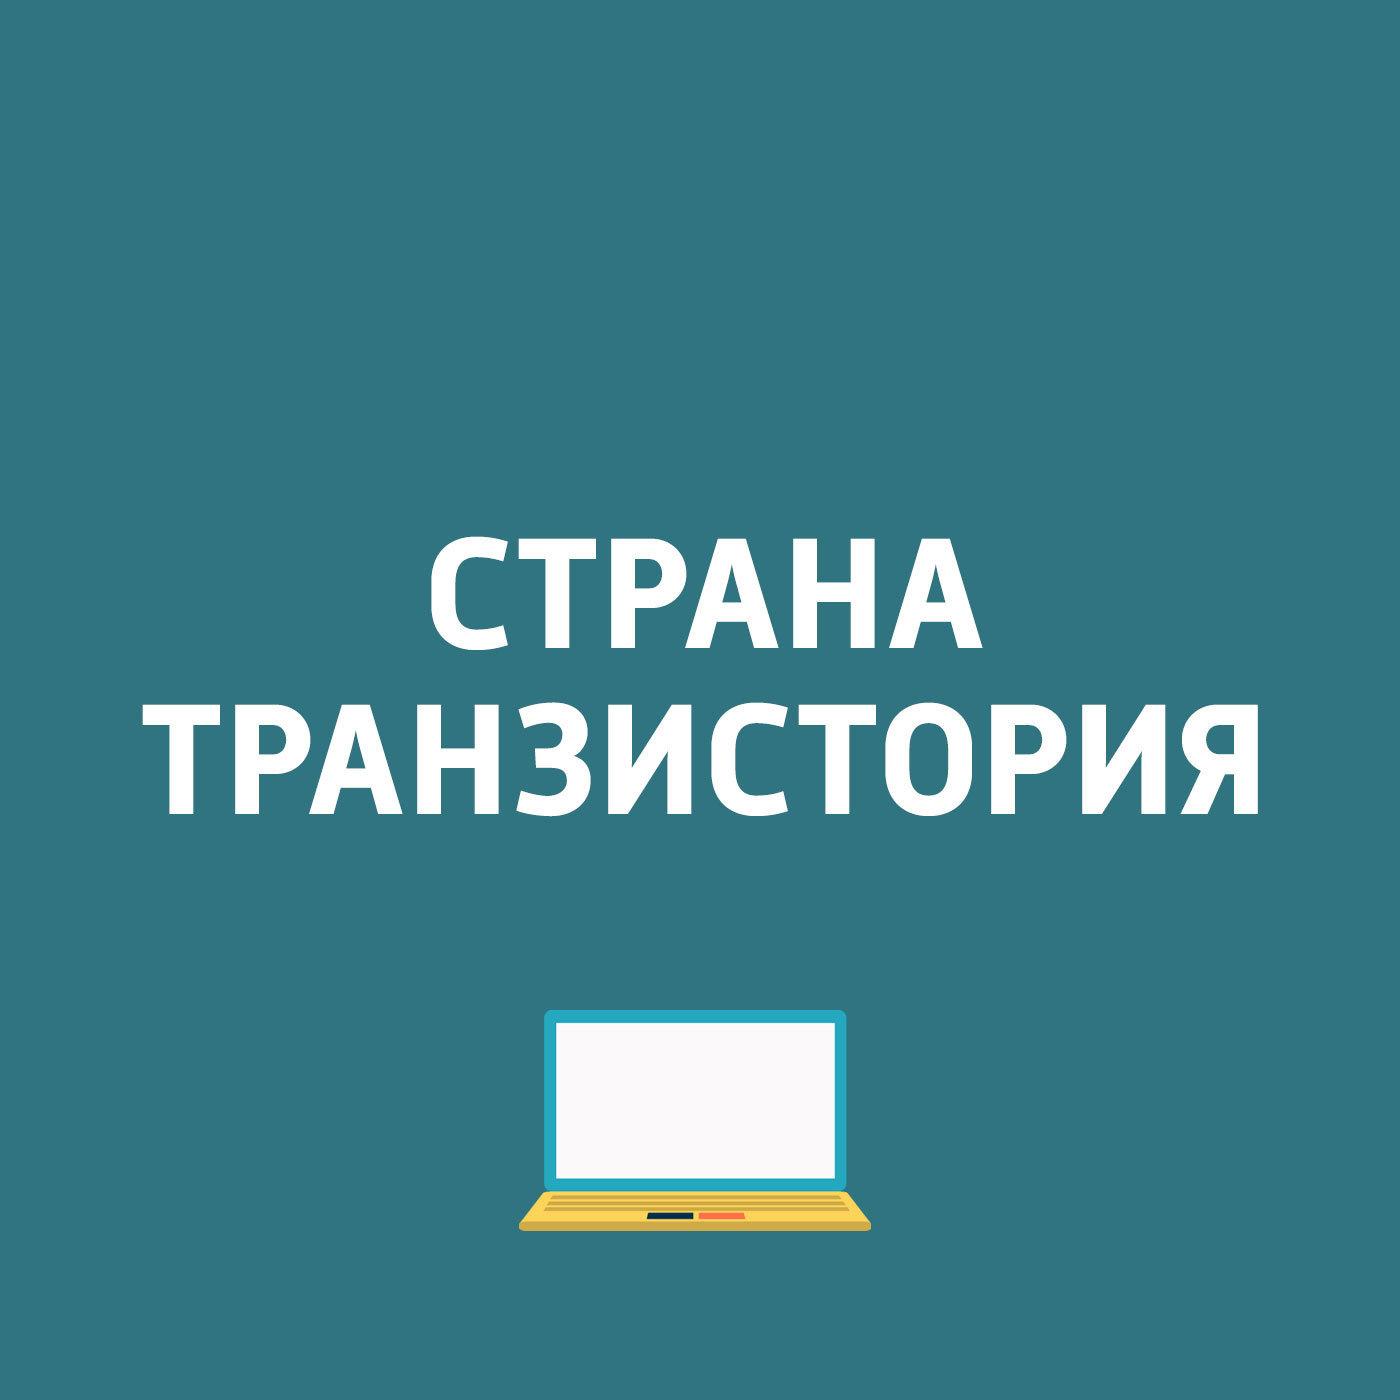 Картаев Павел Презентации Nokia 3, Nokia 5, Nokia 6 и Nokia 3310 зу partner nokia 3310